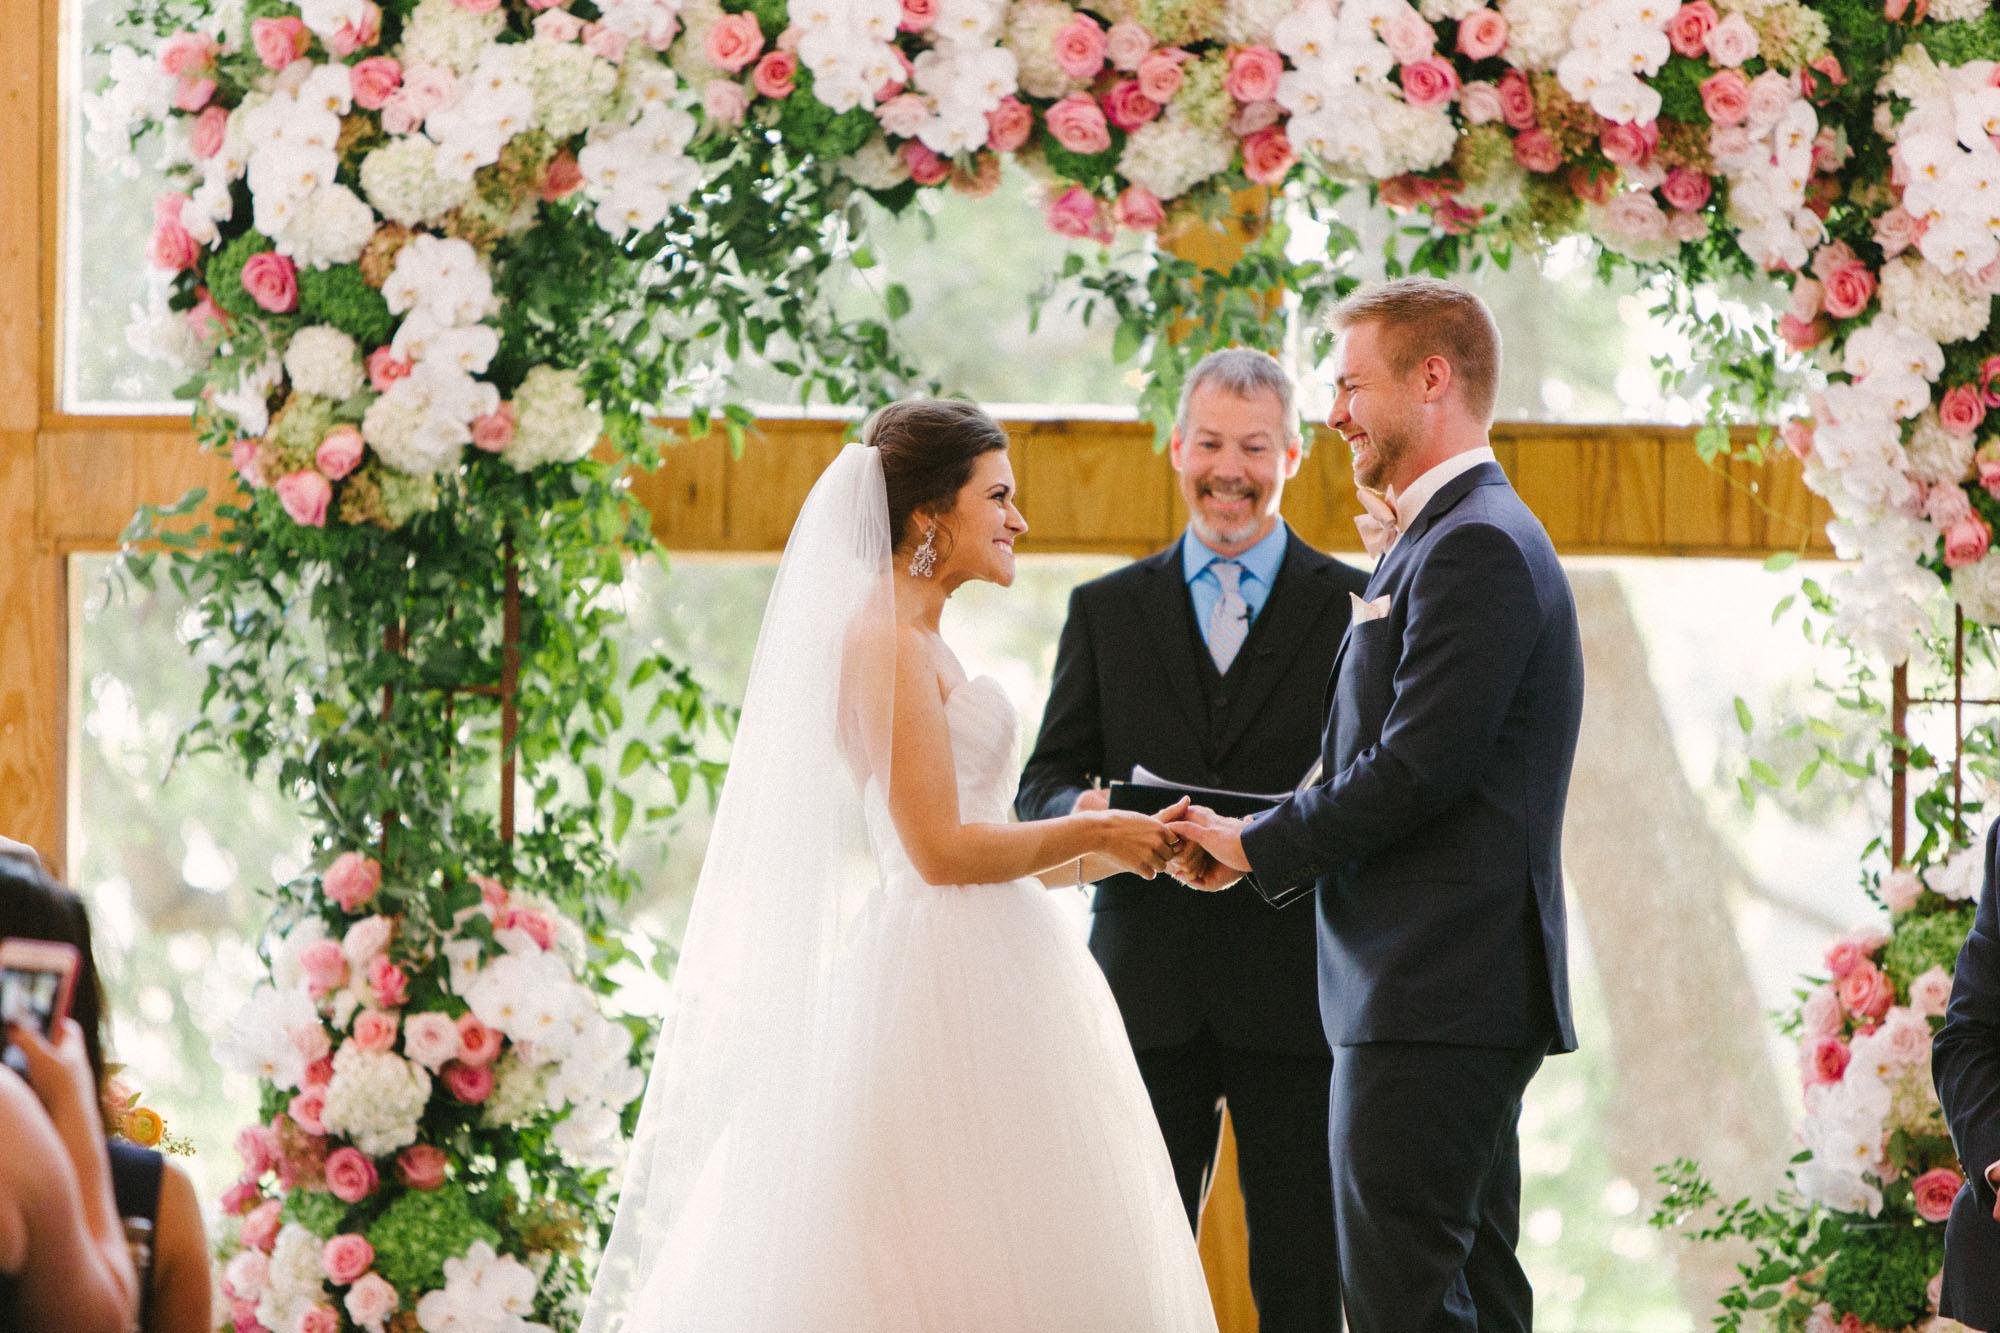 SM anna smith photography wedding photographer venue wedding planner-491.jpg